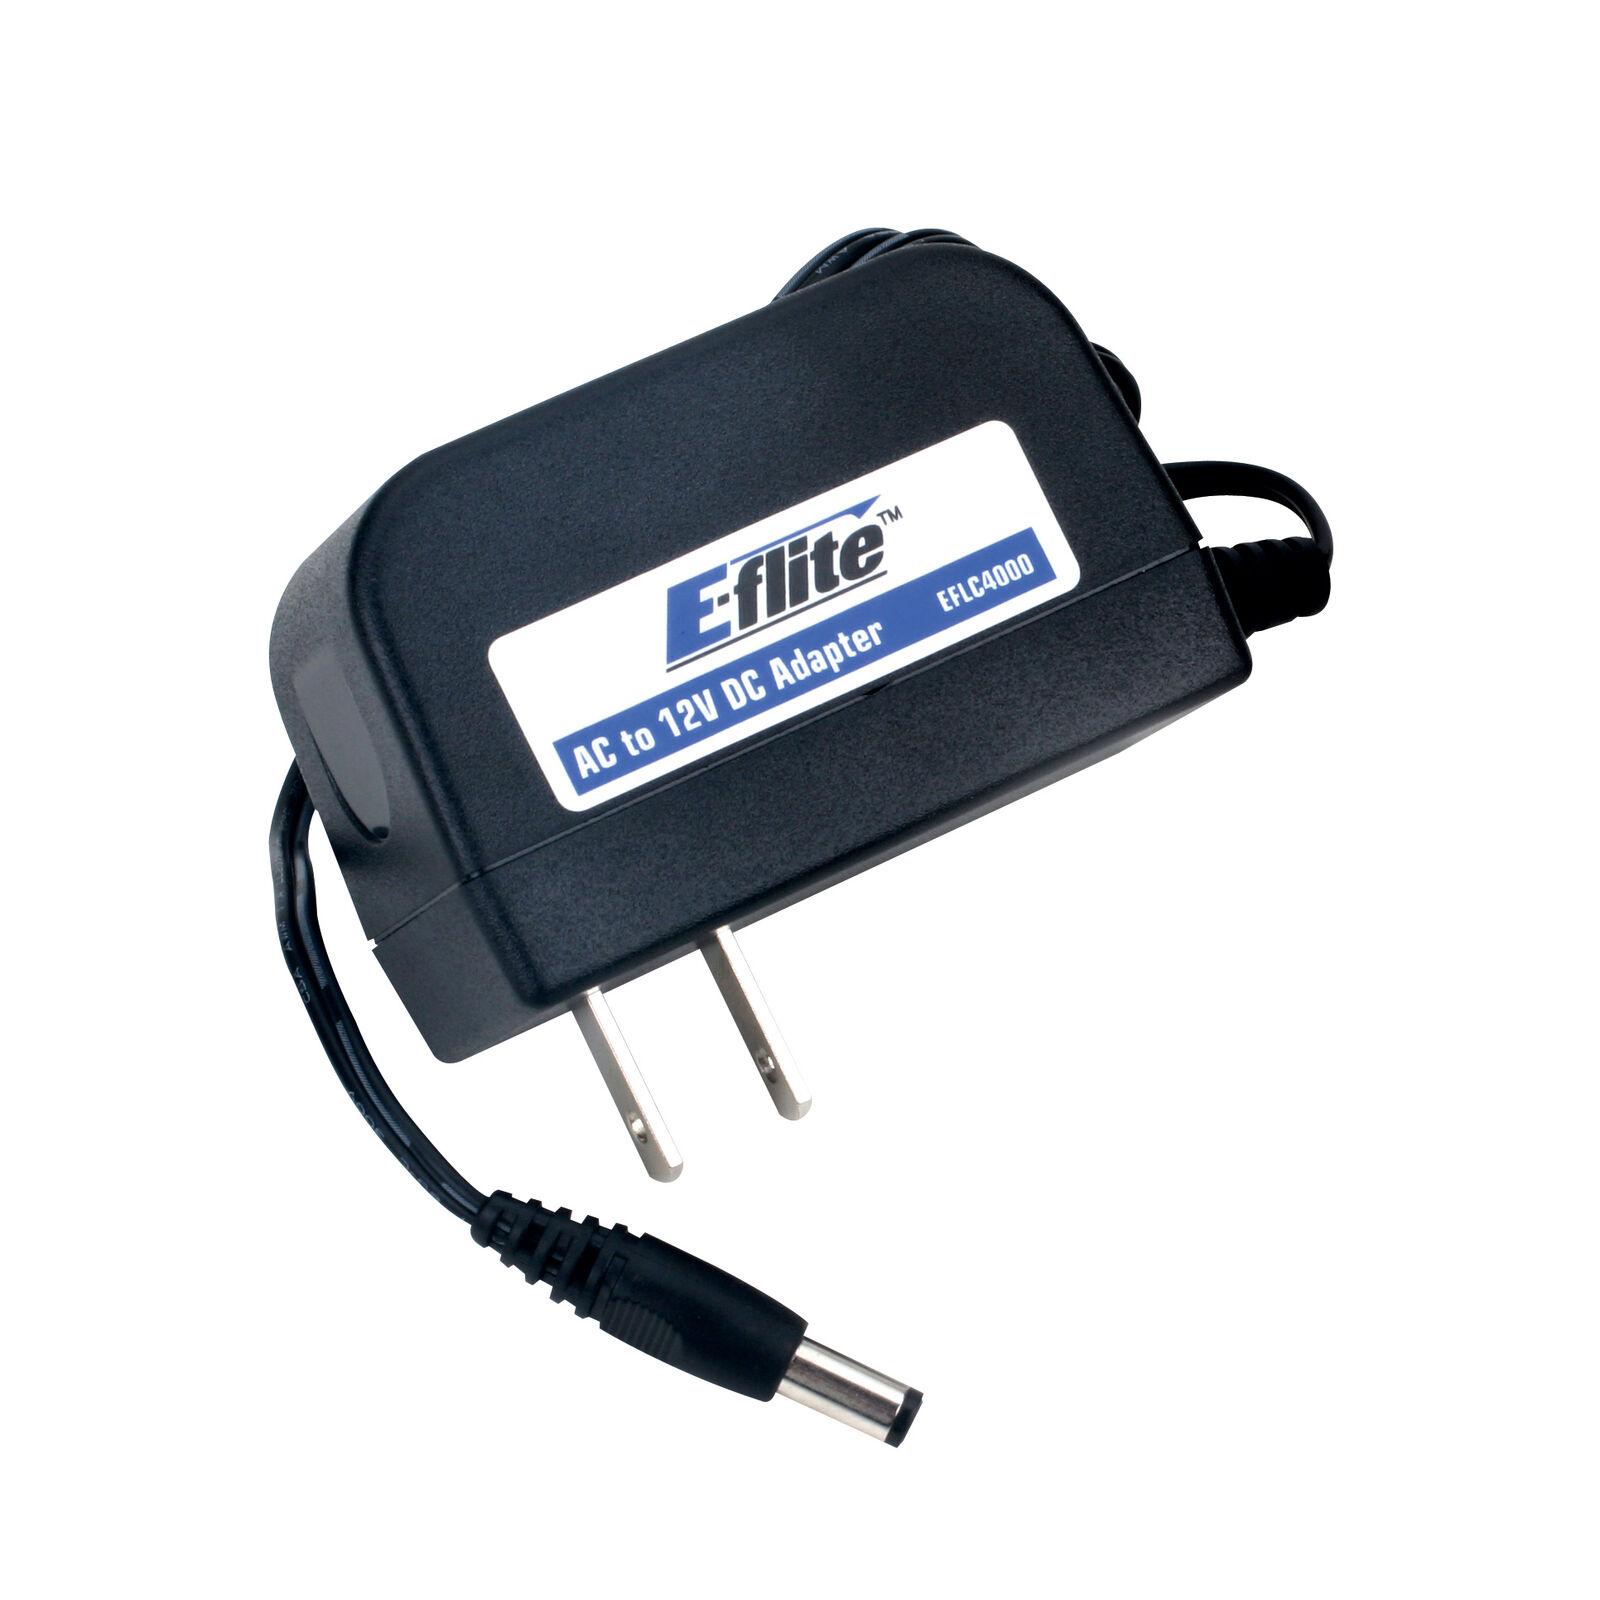 AC to 12VDC, 1.5-Amp Power Supply